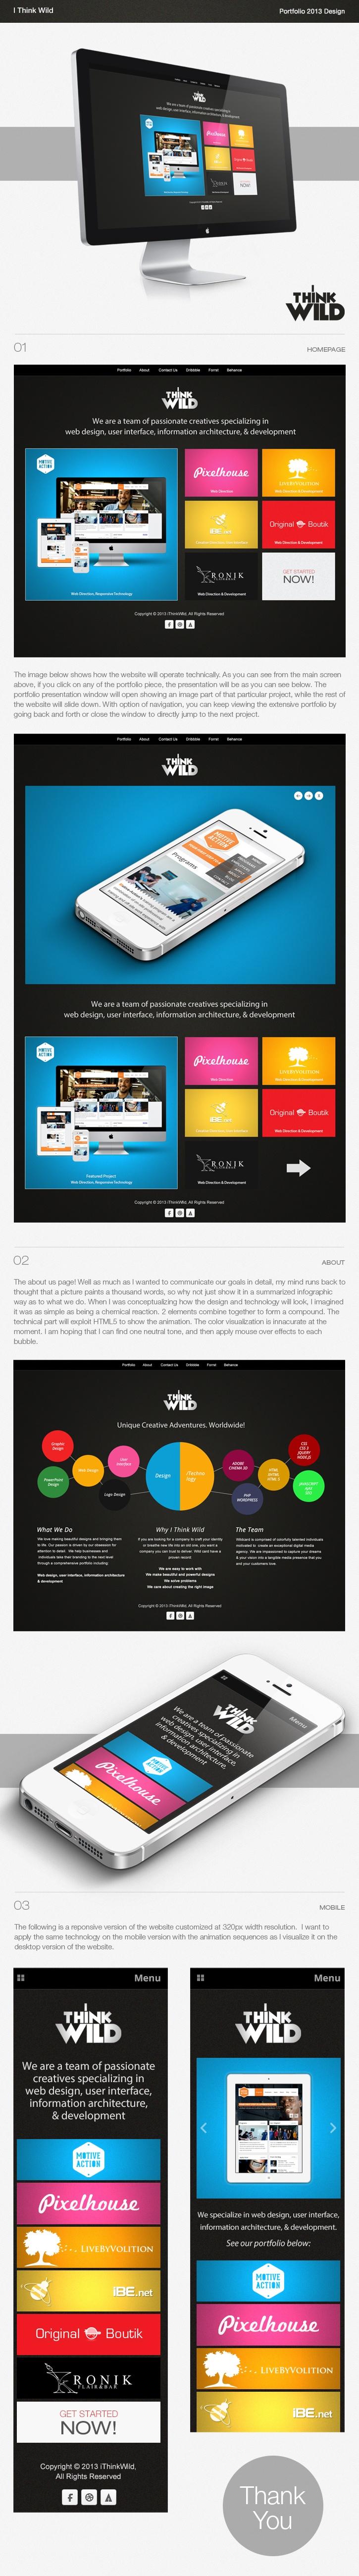 I Think Wild Portfolio Redesign 2013